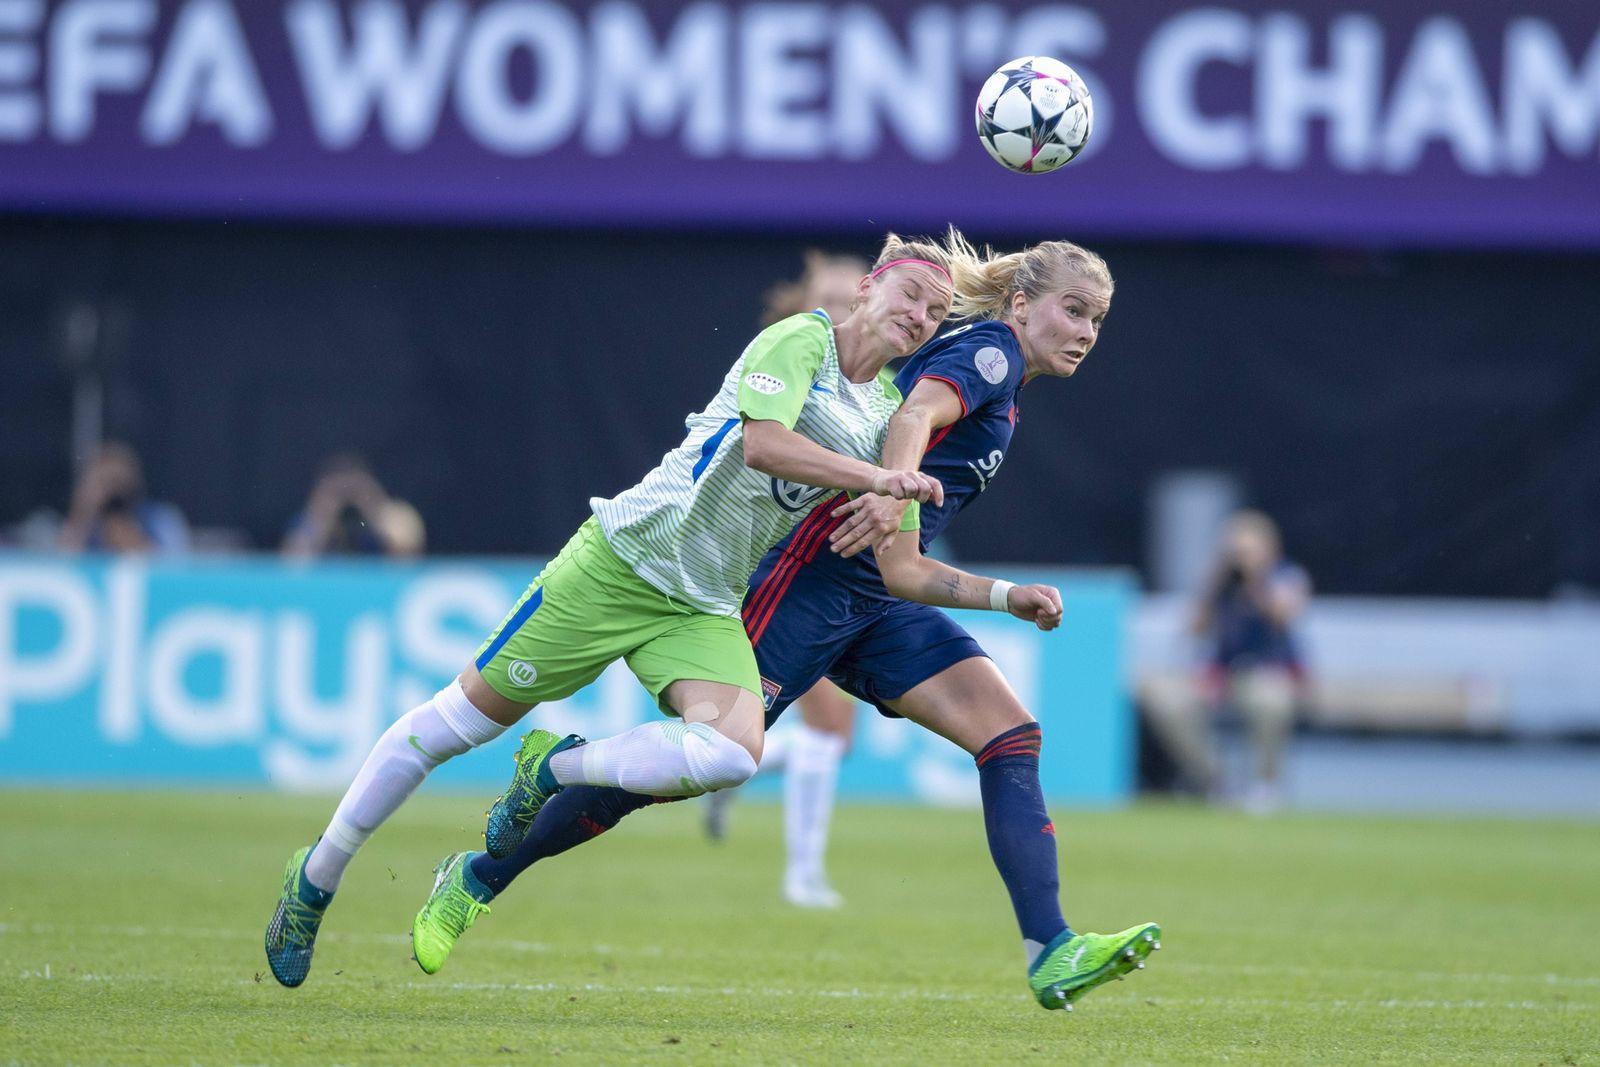 EINMALIGE VERWENDUNG Ada Hegerberg Lyon/ Alexandra Popp Wolfsburg/ Frauen Fußball